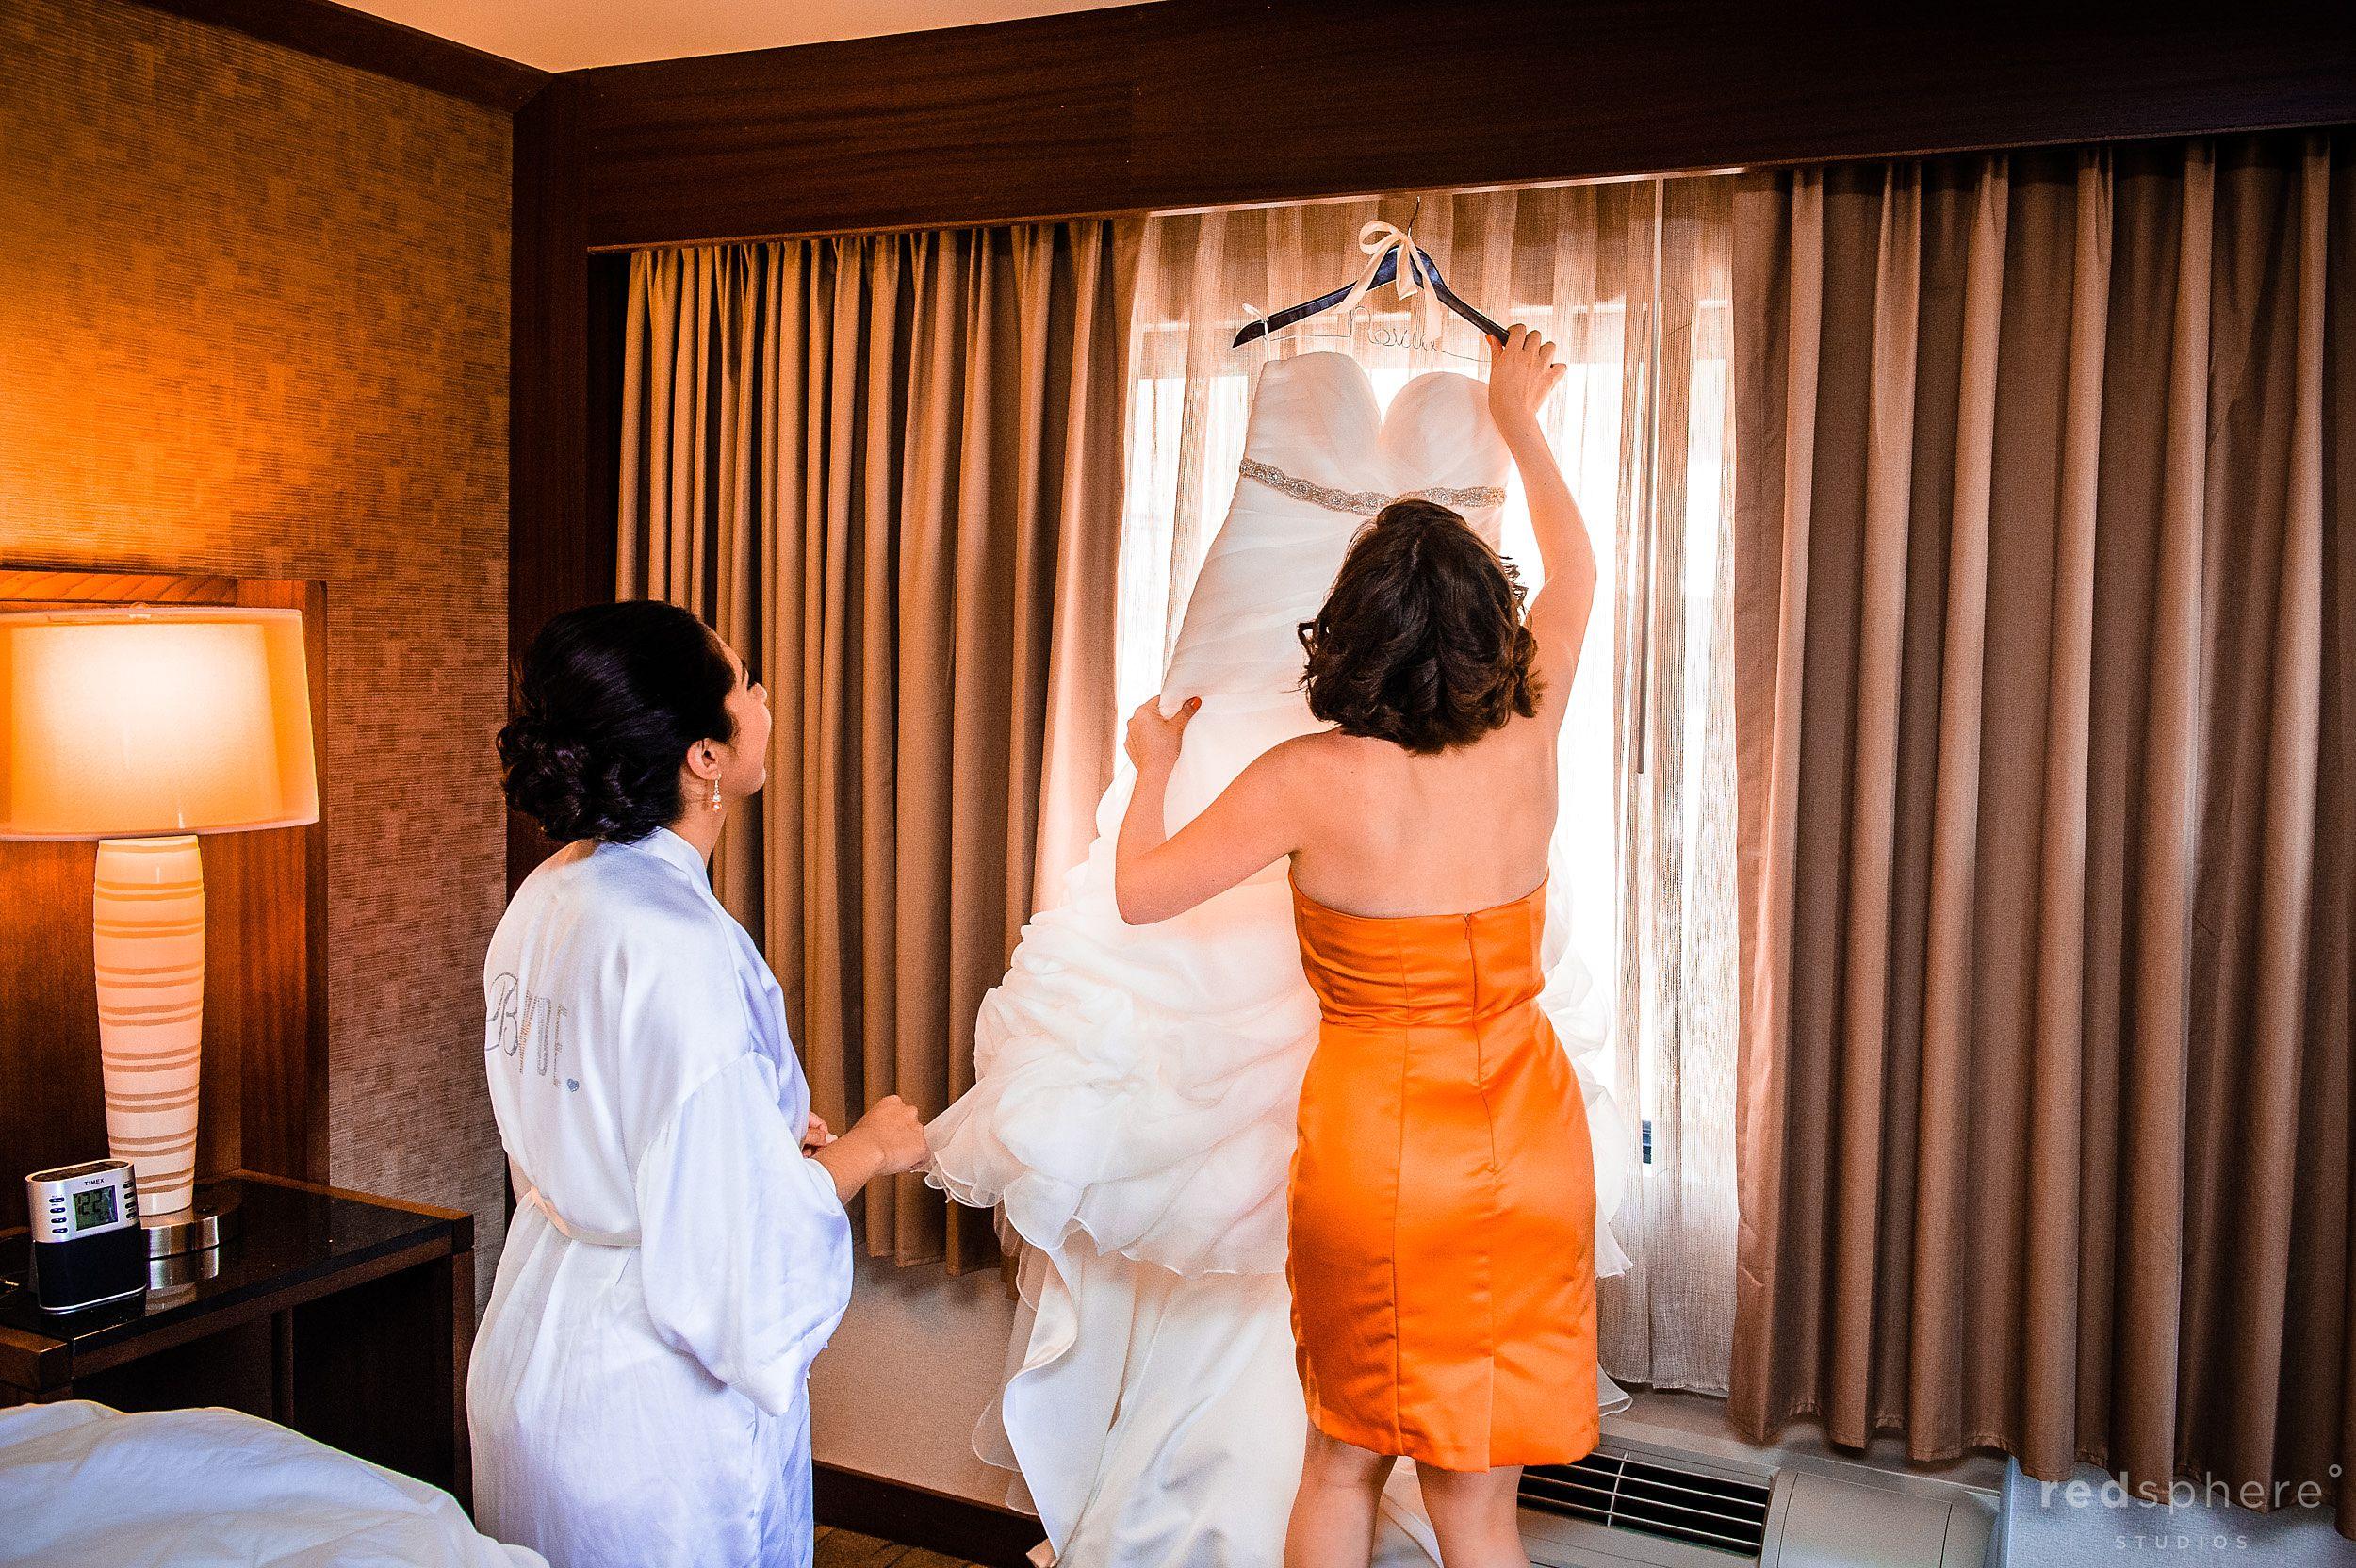 Bridesmaid and Bride Grab Wedding Gown